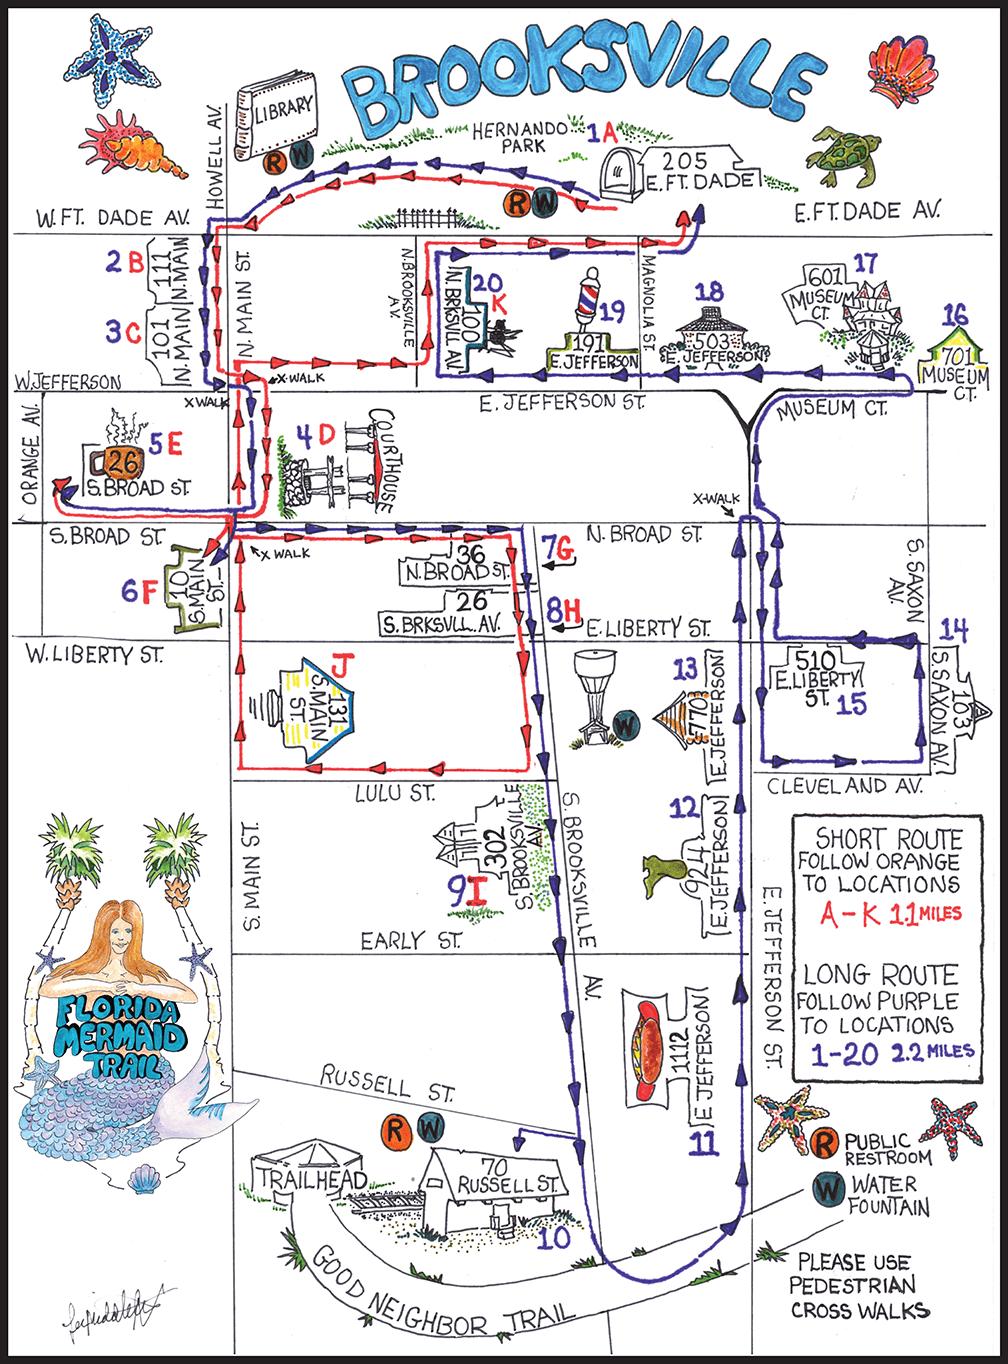 Florida Mermaid Trail Map